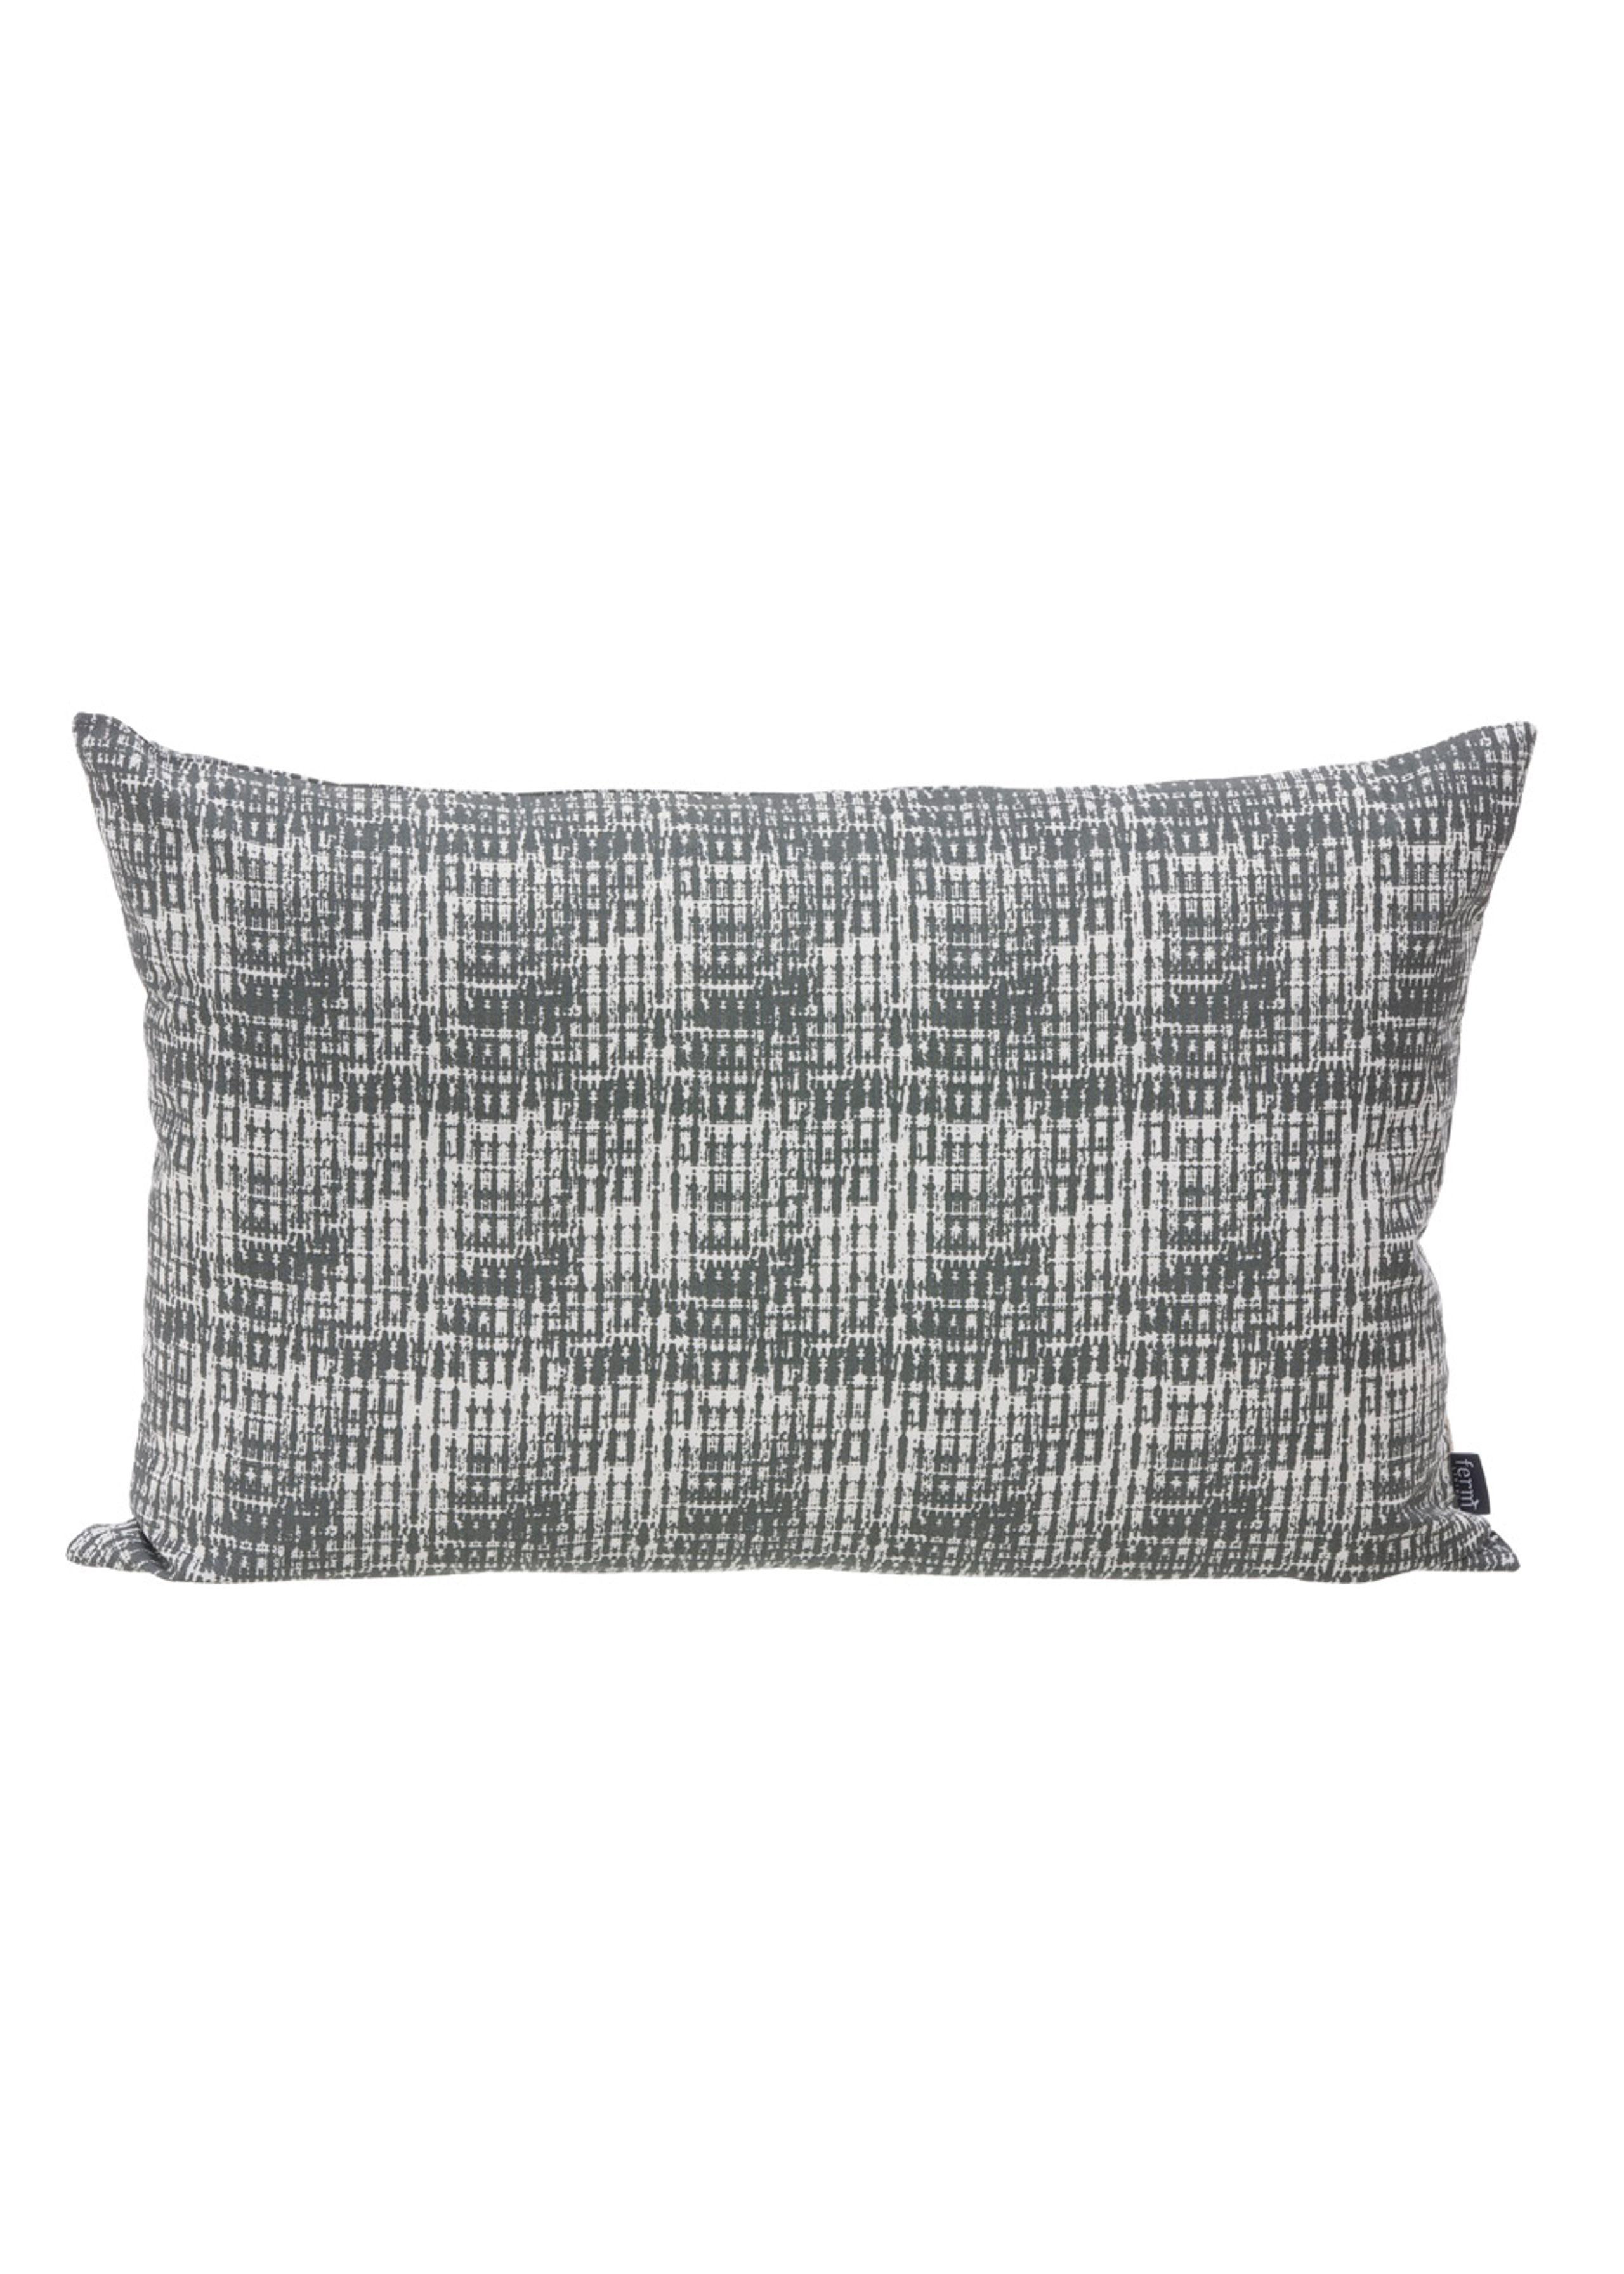 Static cushion